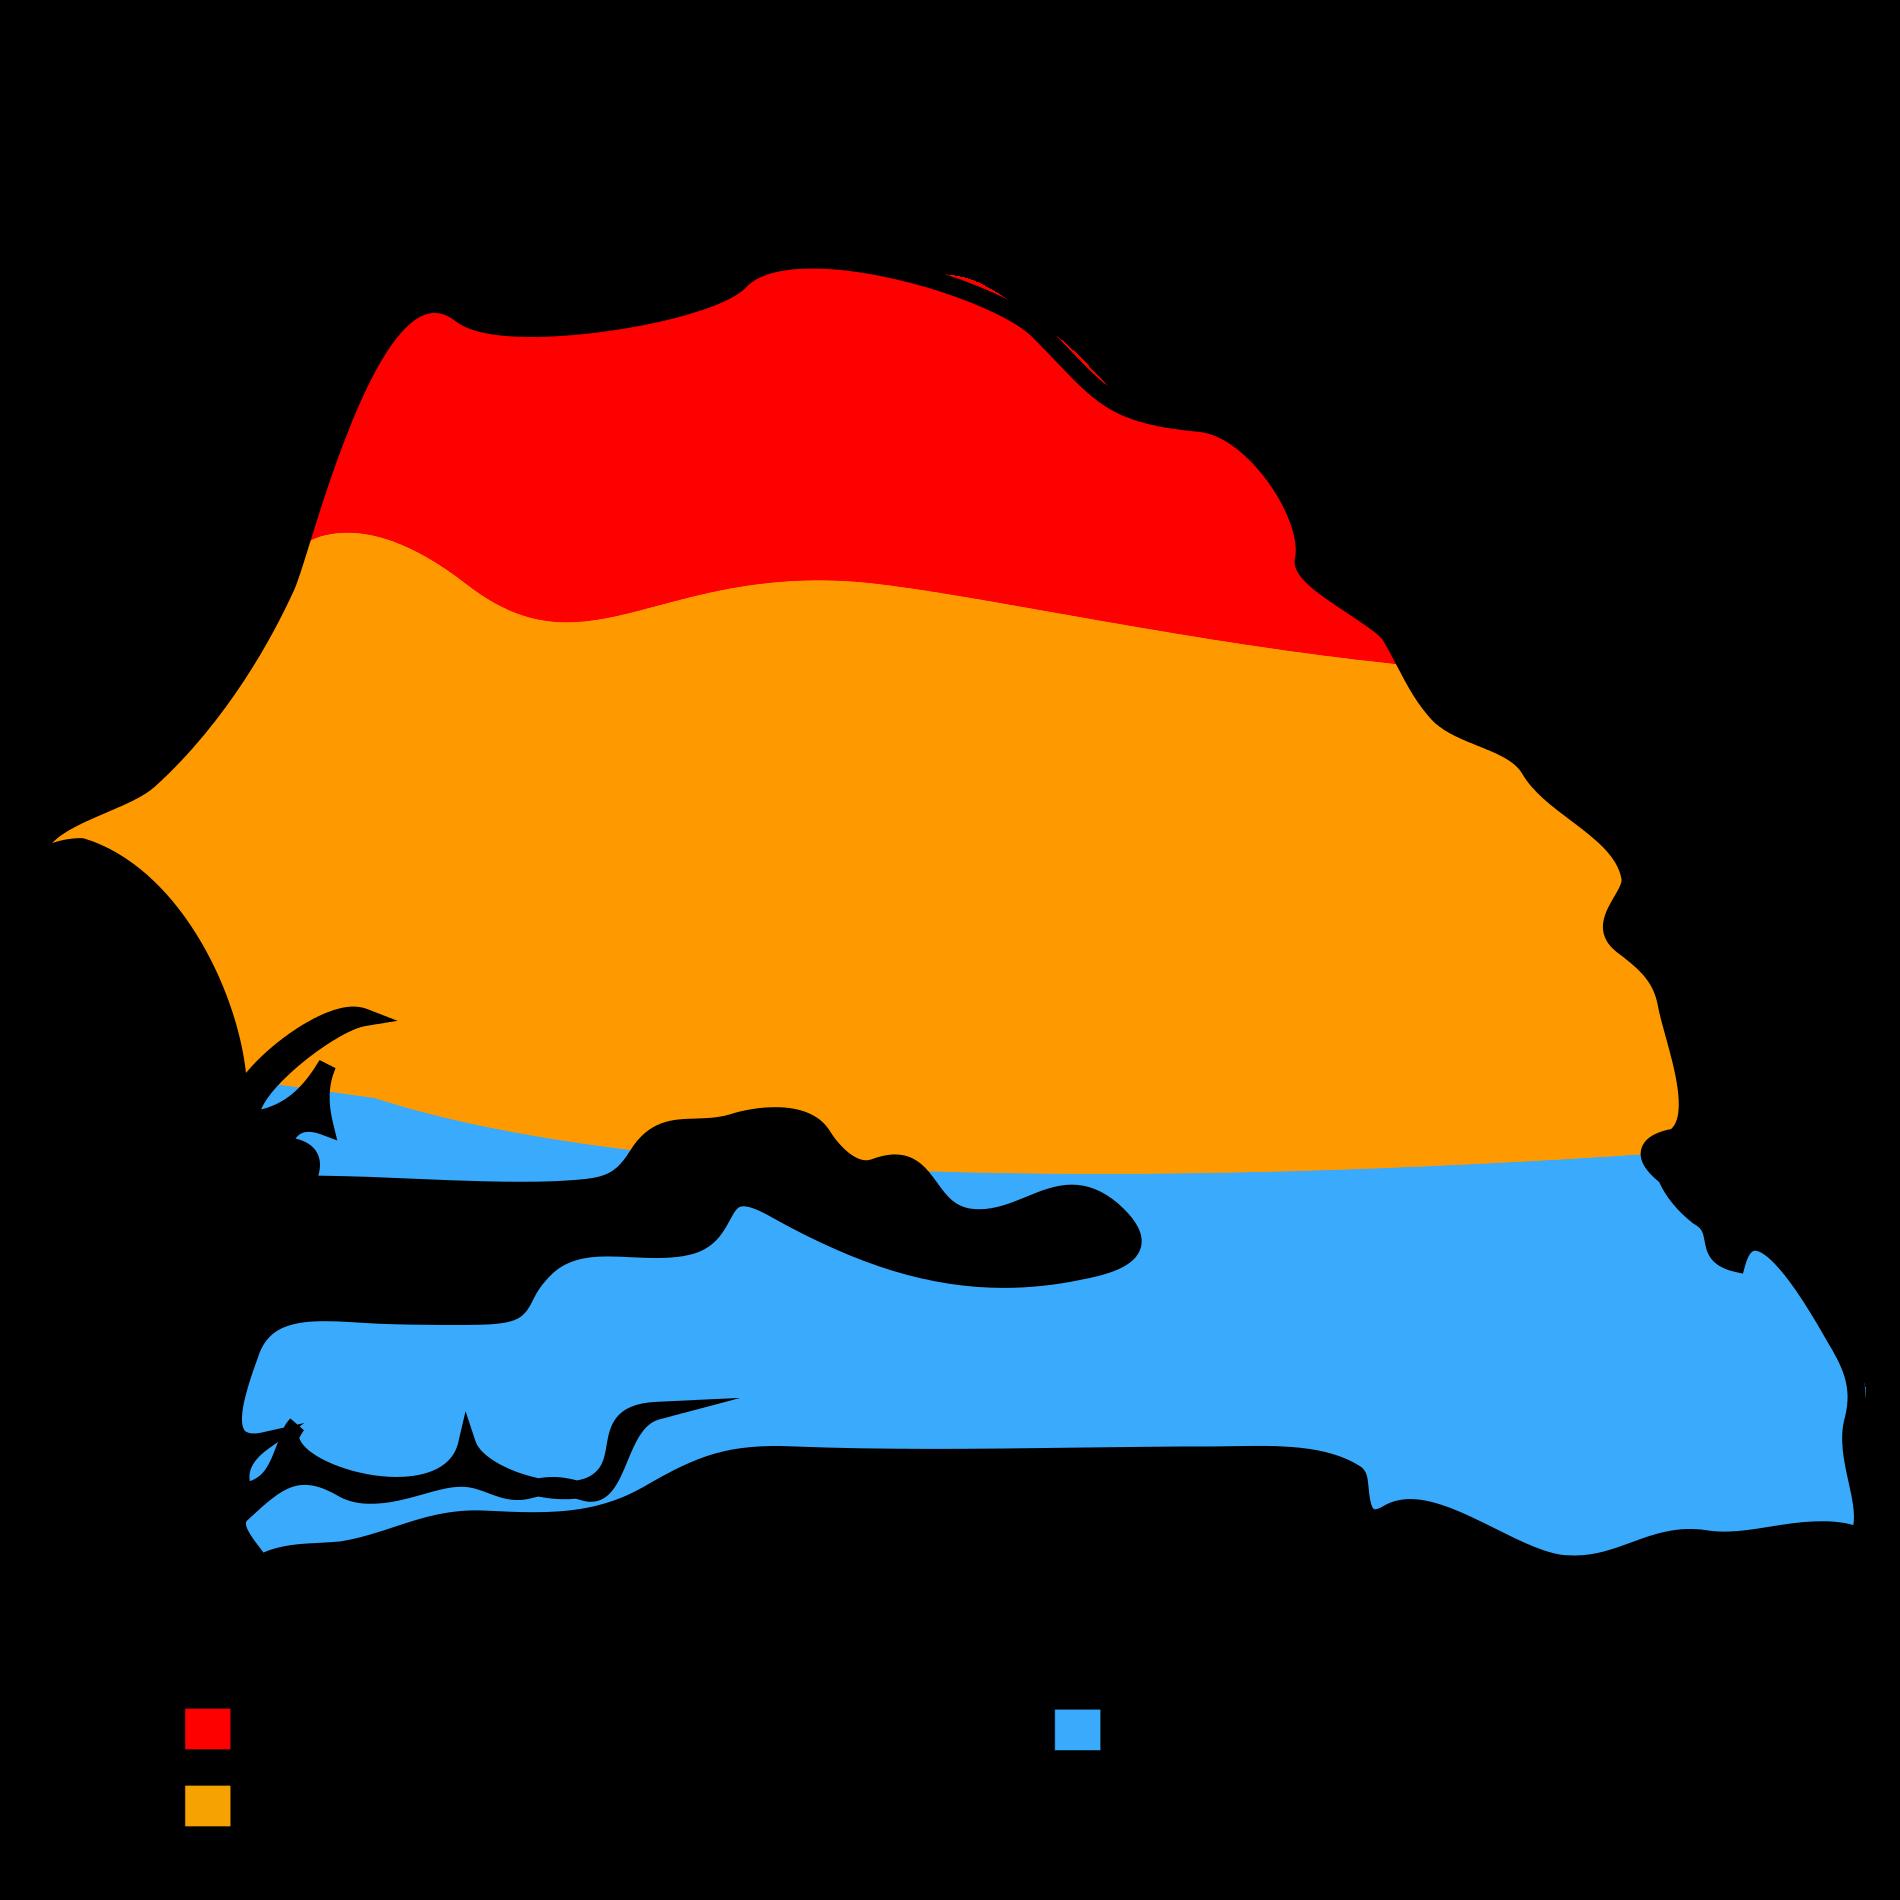 Desert clipart tropical savanna. Senegal map of koppen